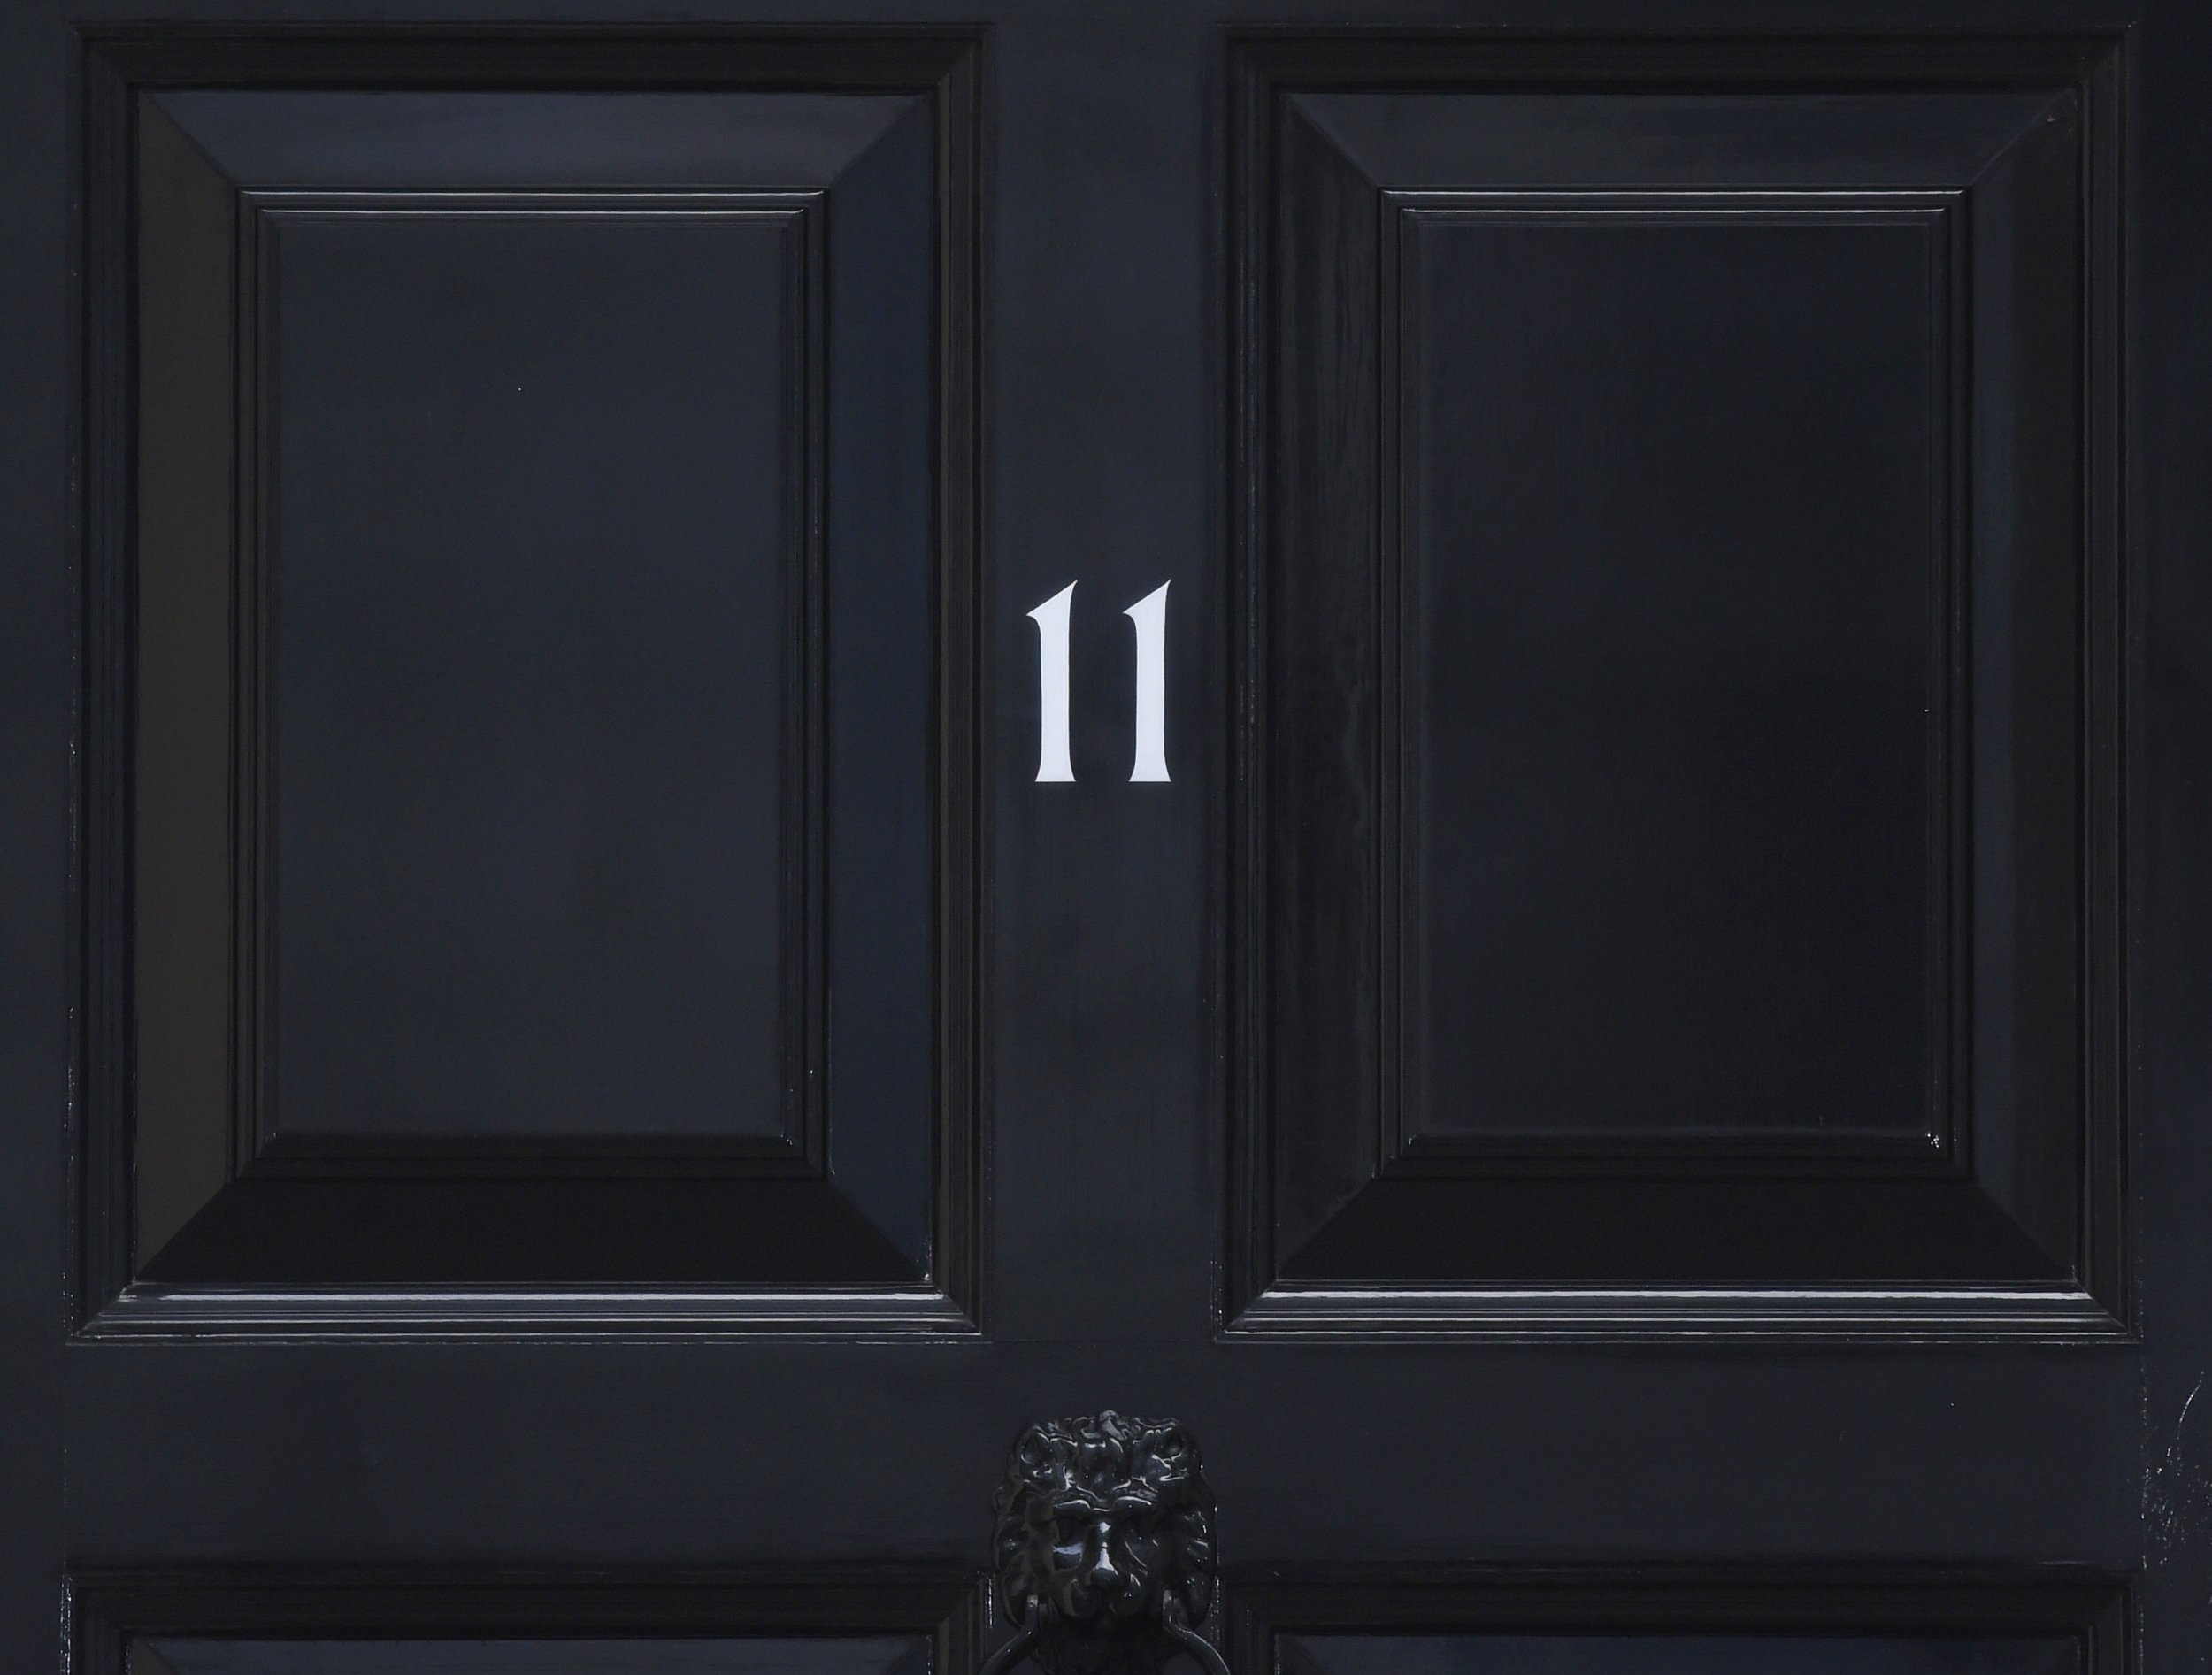 16/03/2016_Number 11